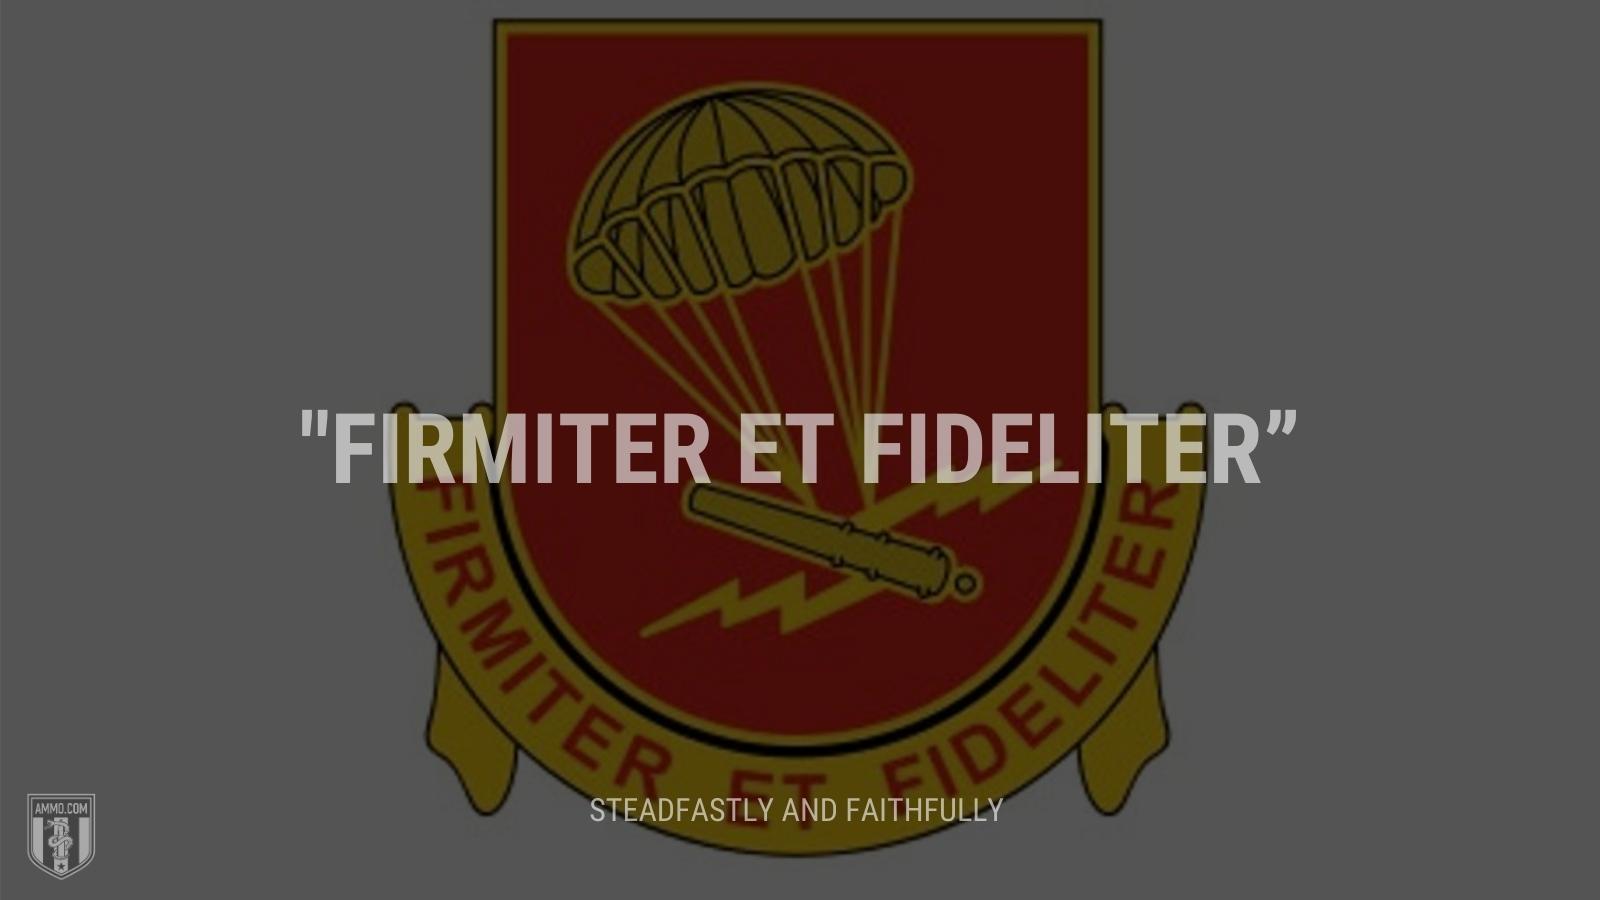 """Firmiter et fideliter"" - Steadfastly and faithfully"